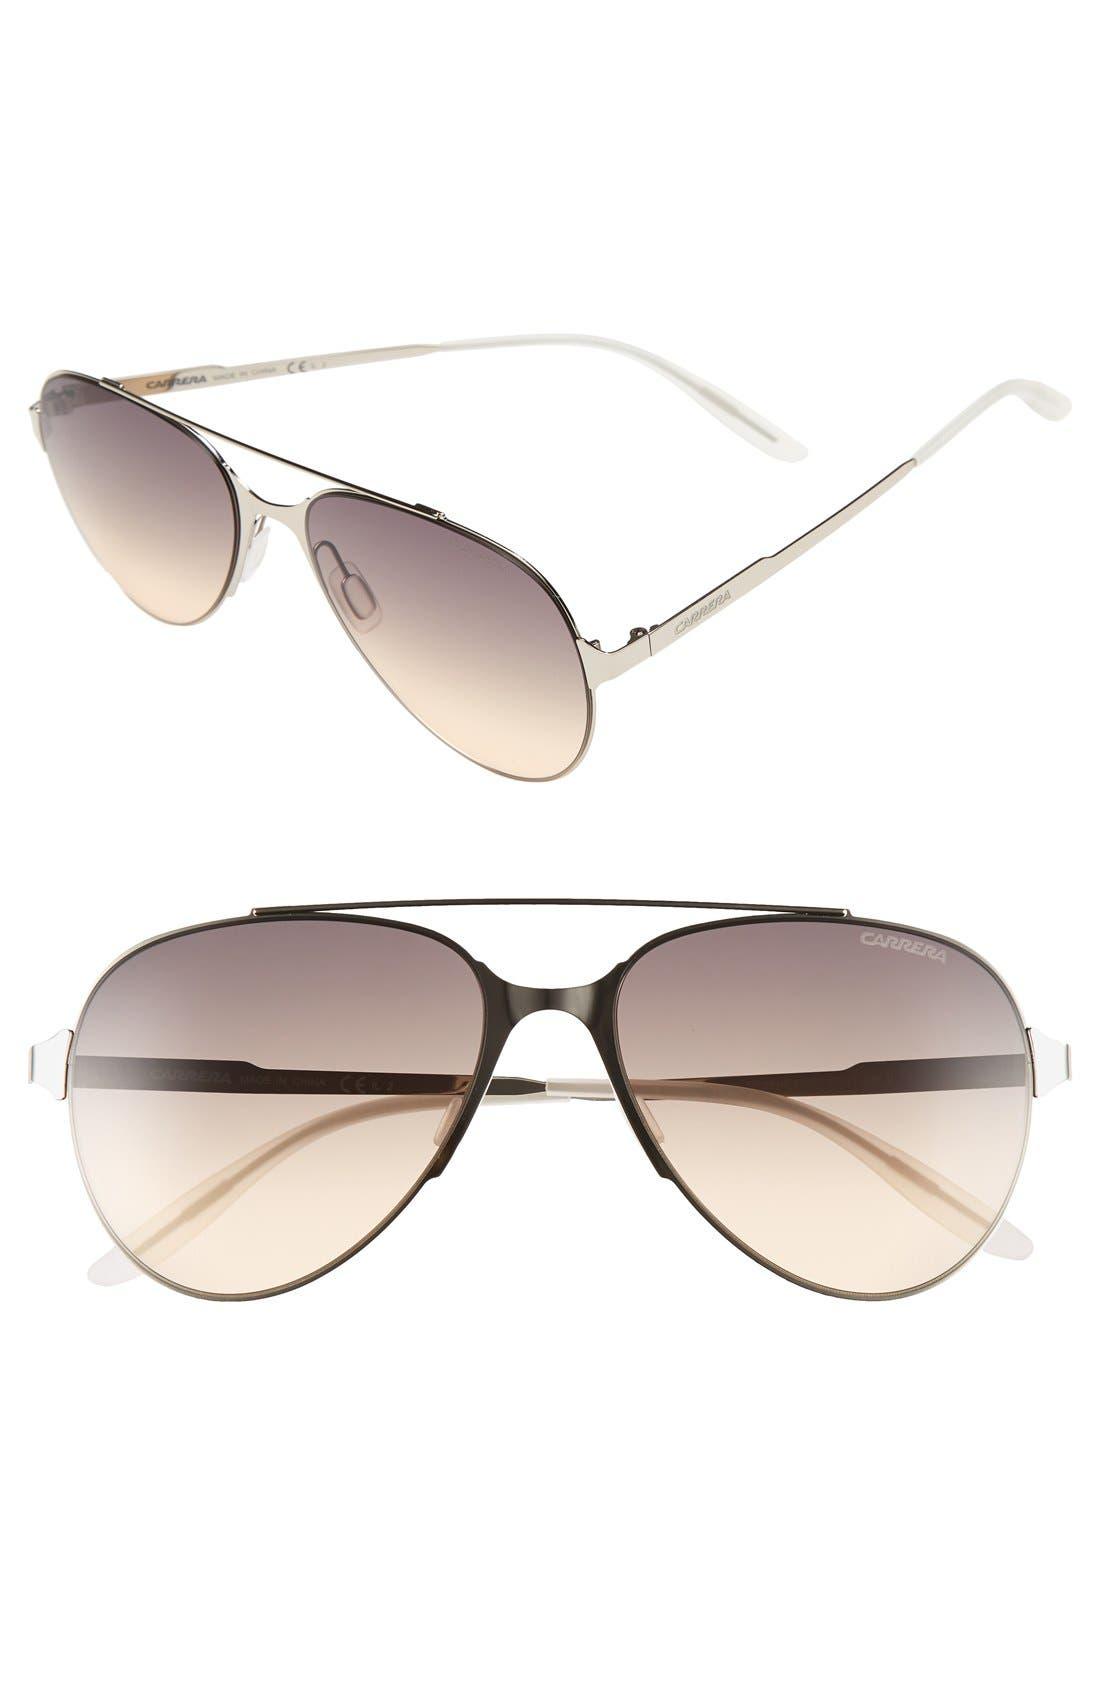 Carrera Eyewear '113/S' Aviator Sunglasses